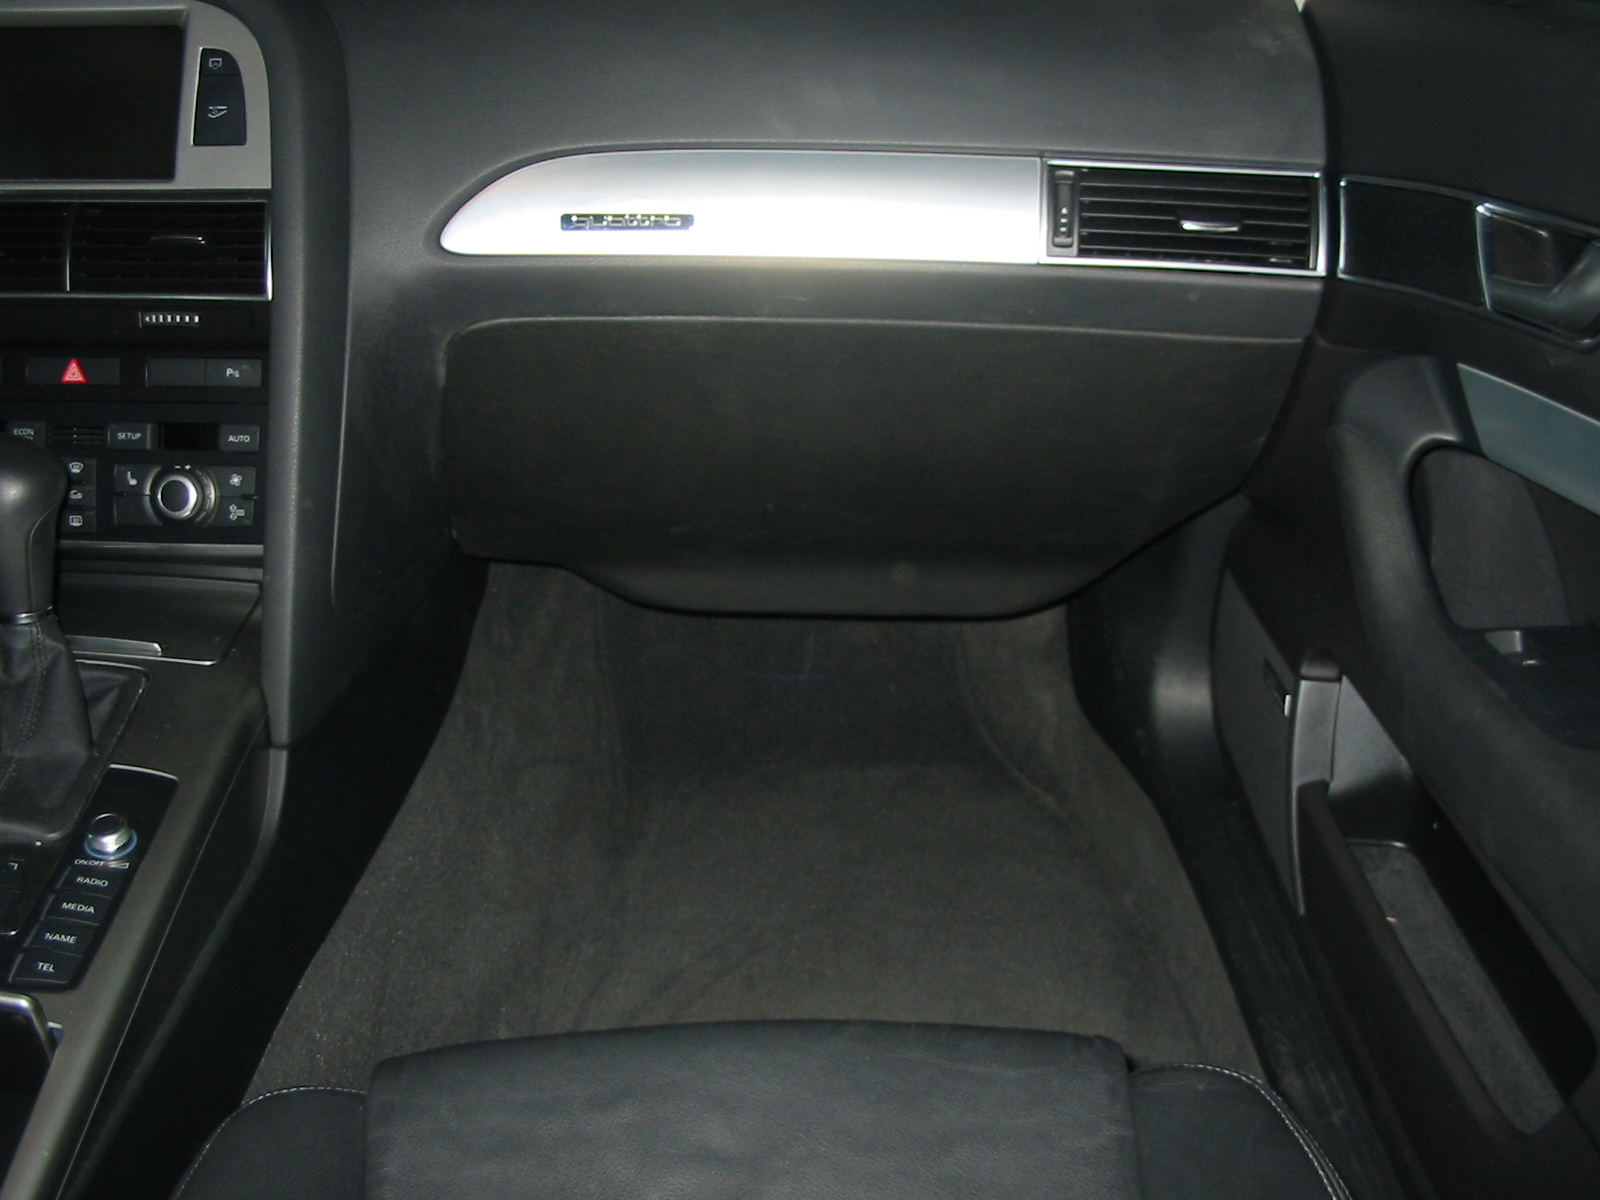 Audi A6 - 25er im Beifahrer-Fußraum